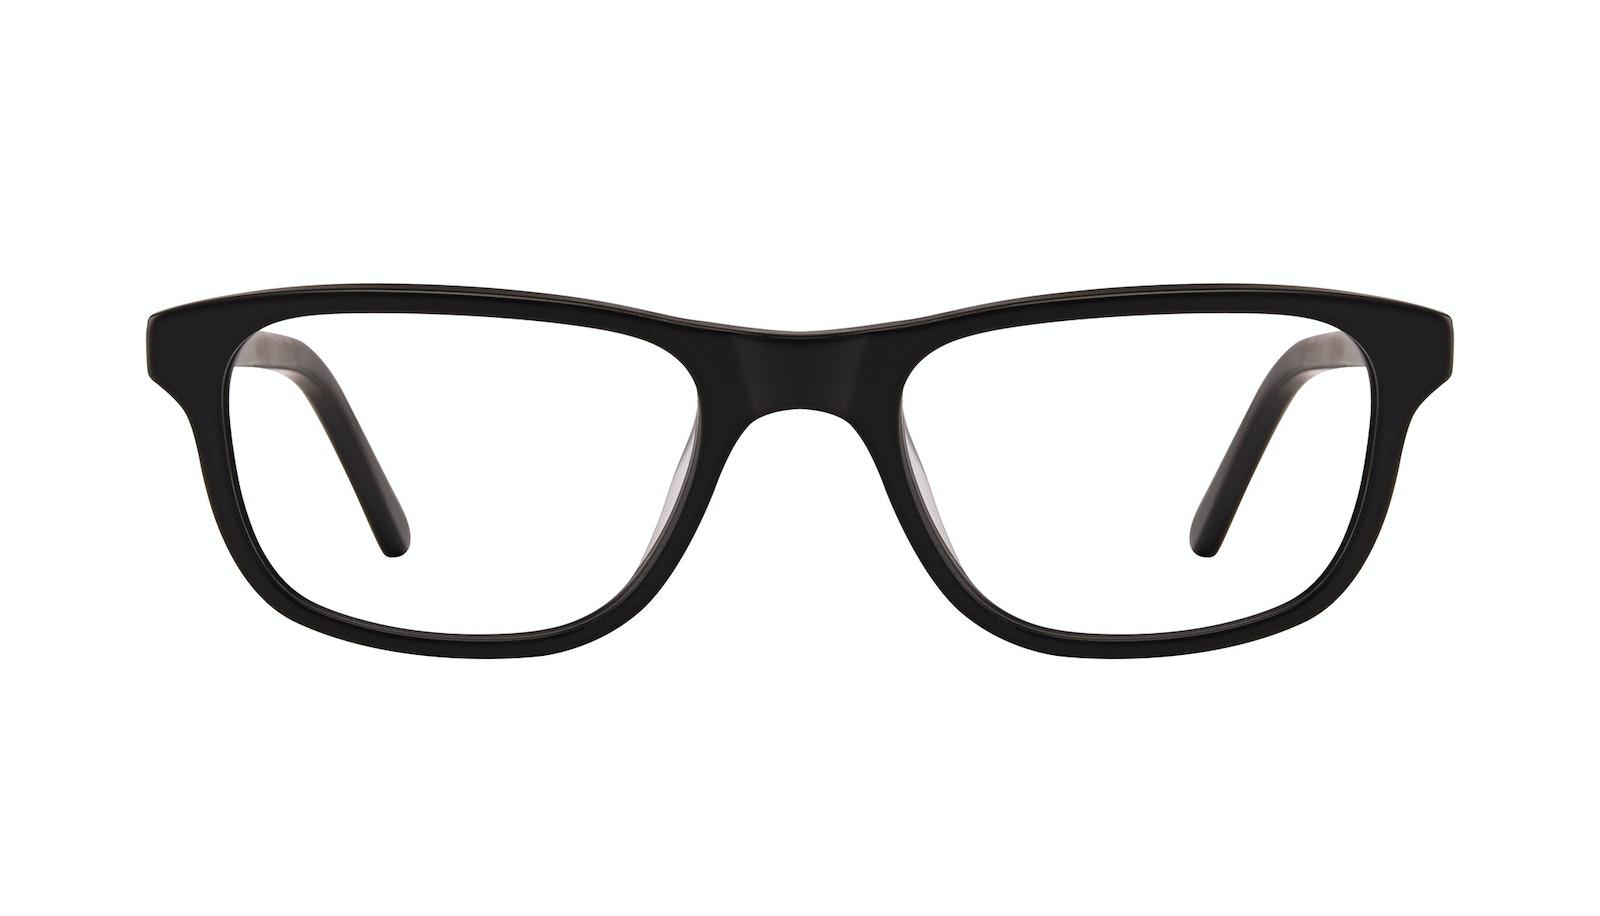 Affordable Fashion Glasses Rectangle Eyeglasses Men Neat Matte Black